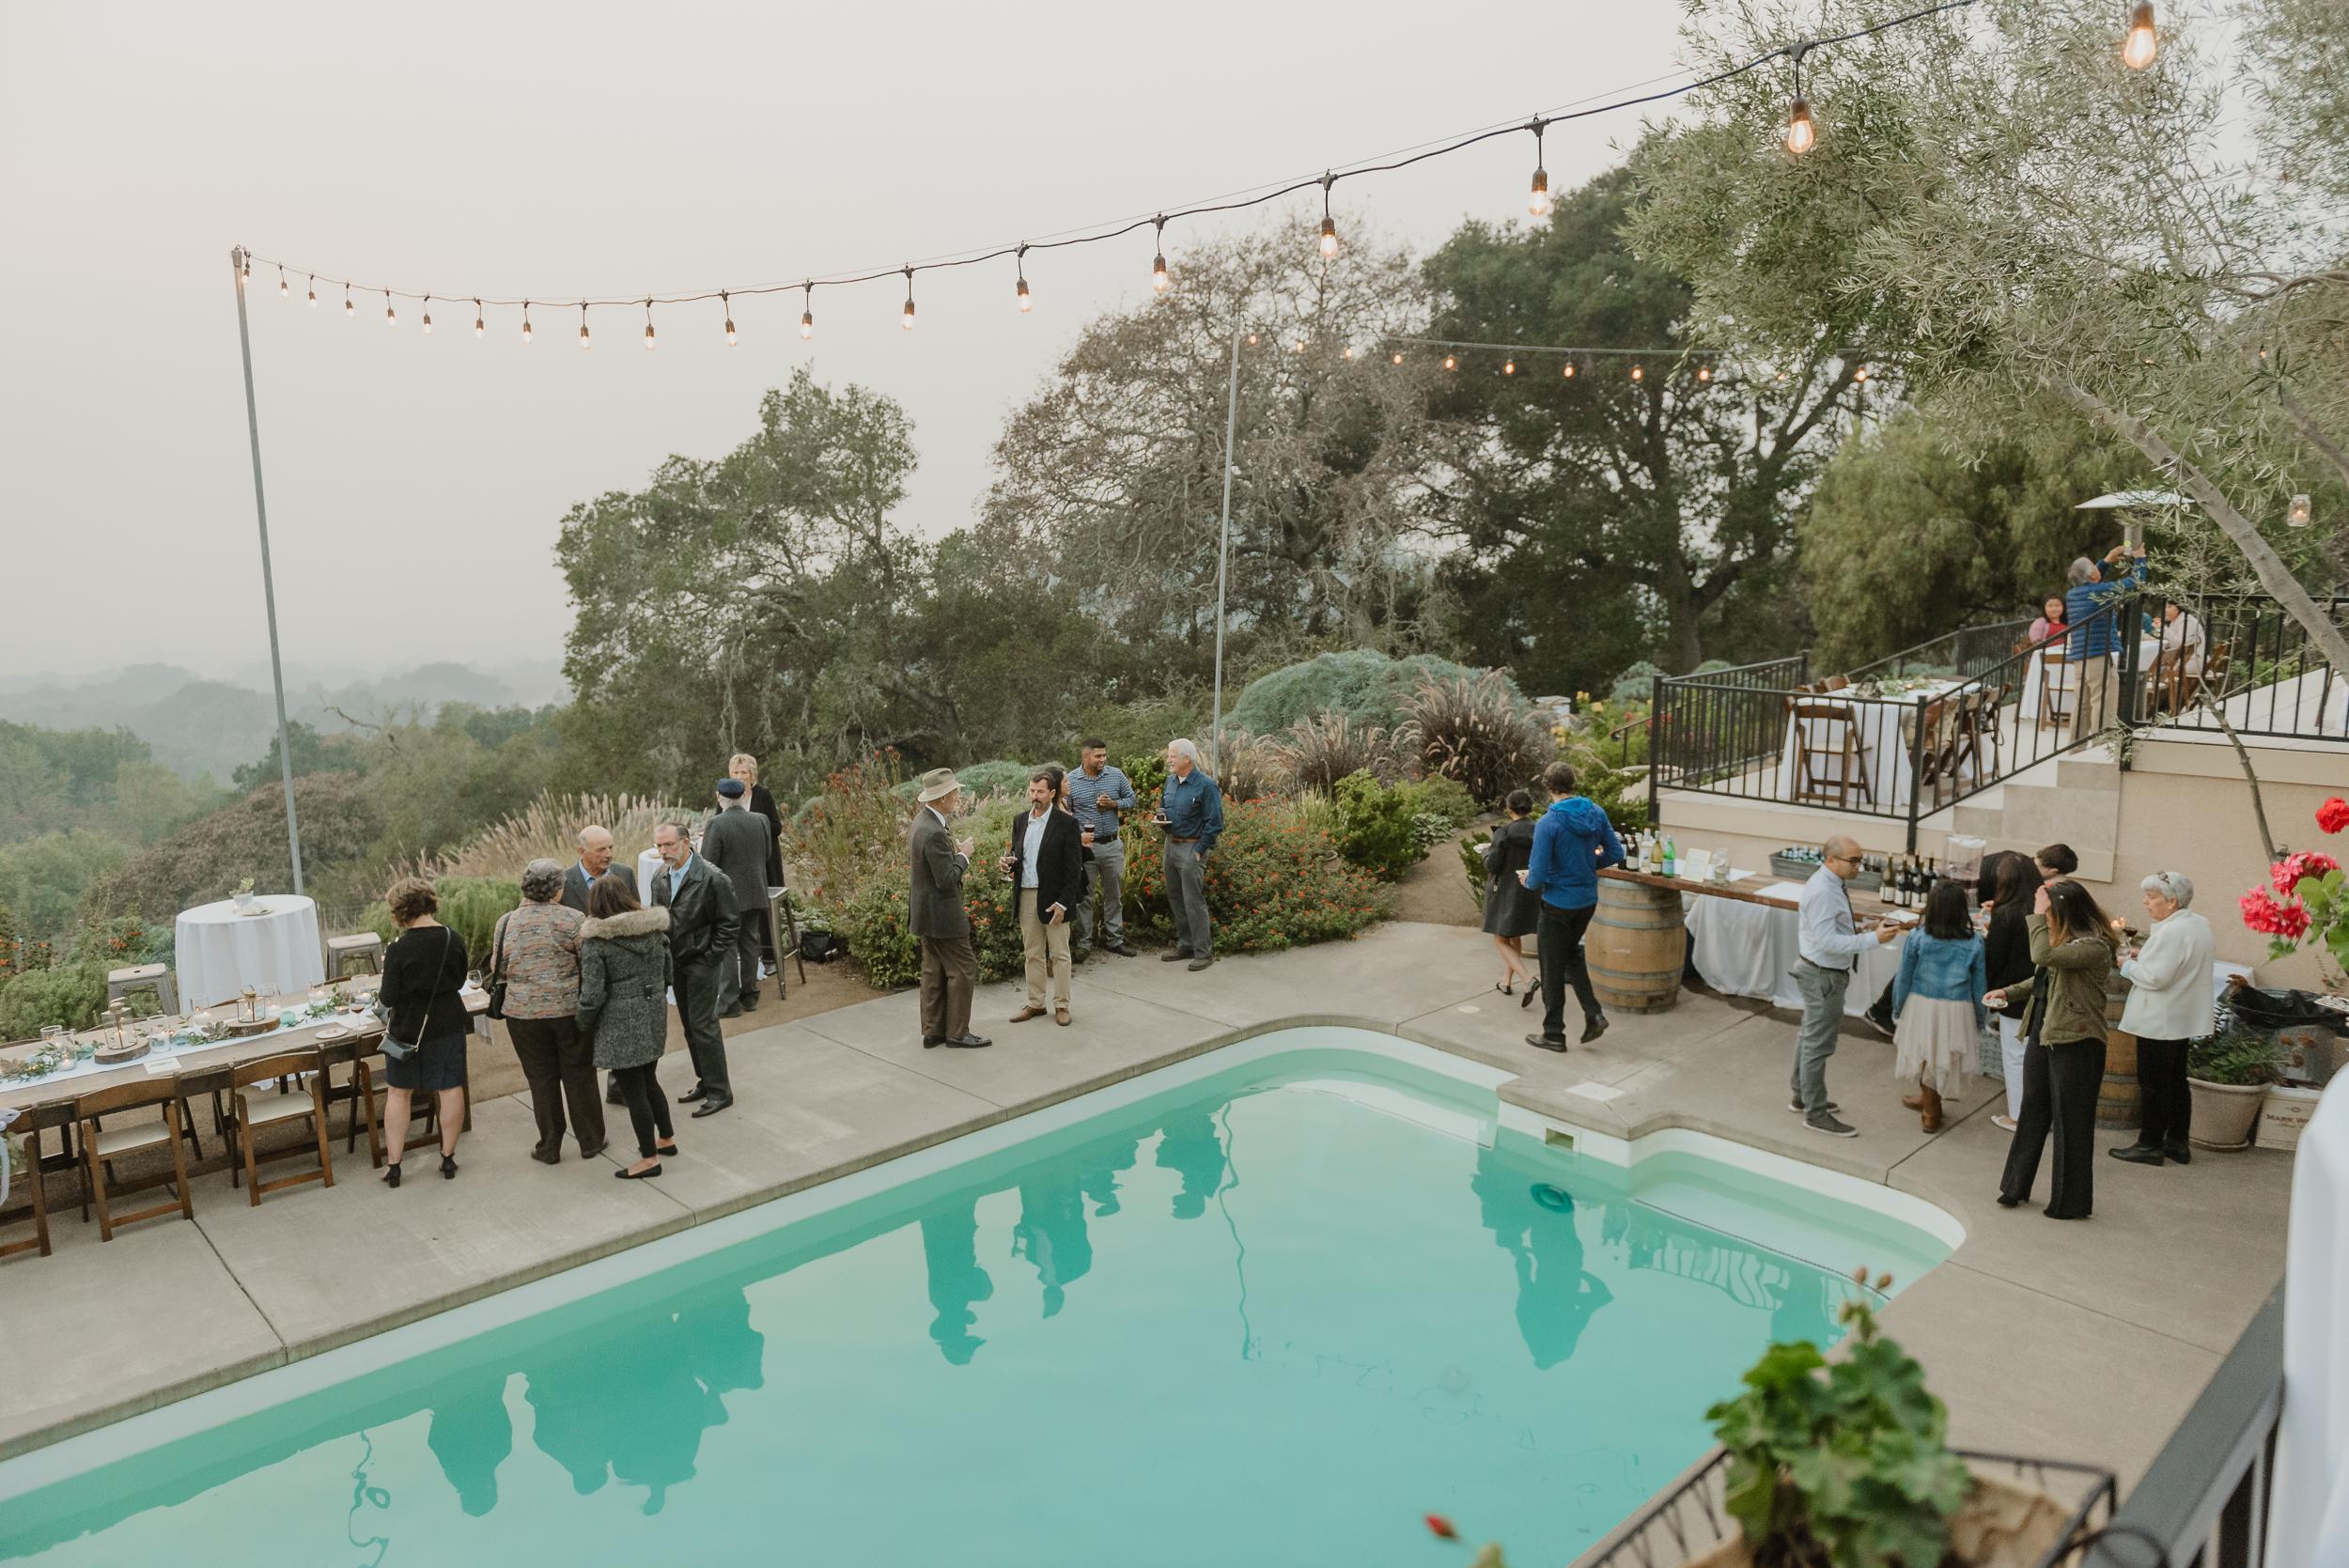 090marin-petaluma-backyard-wedding-vivianchen-558.jpg